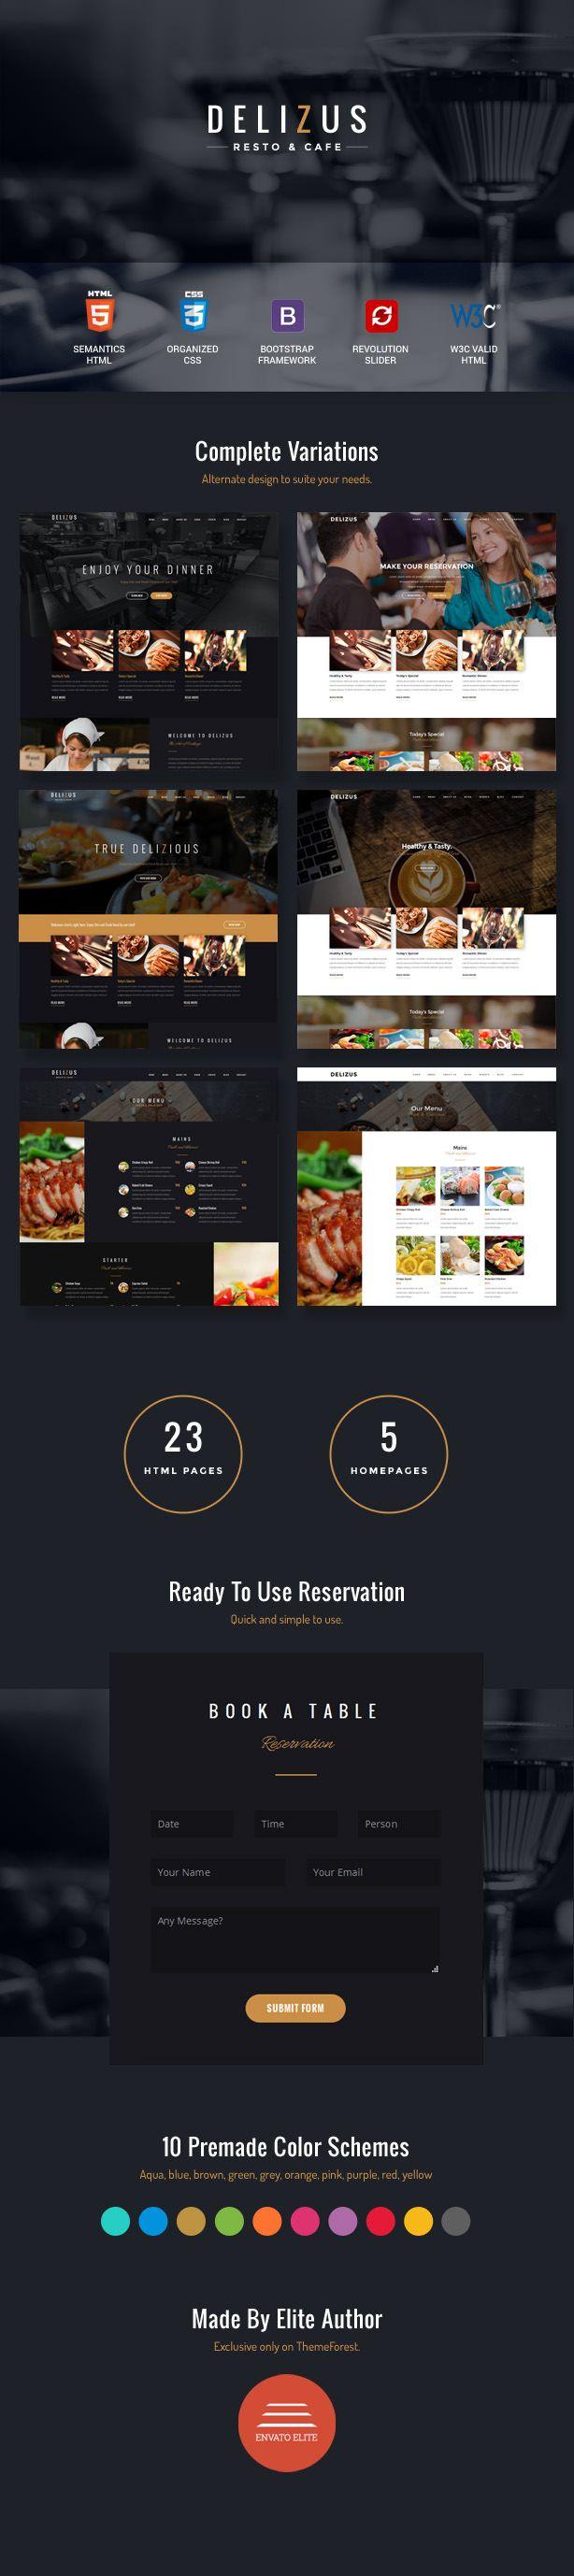 Restaurant Website Template - Delizus | Restaurant website templates ...